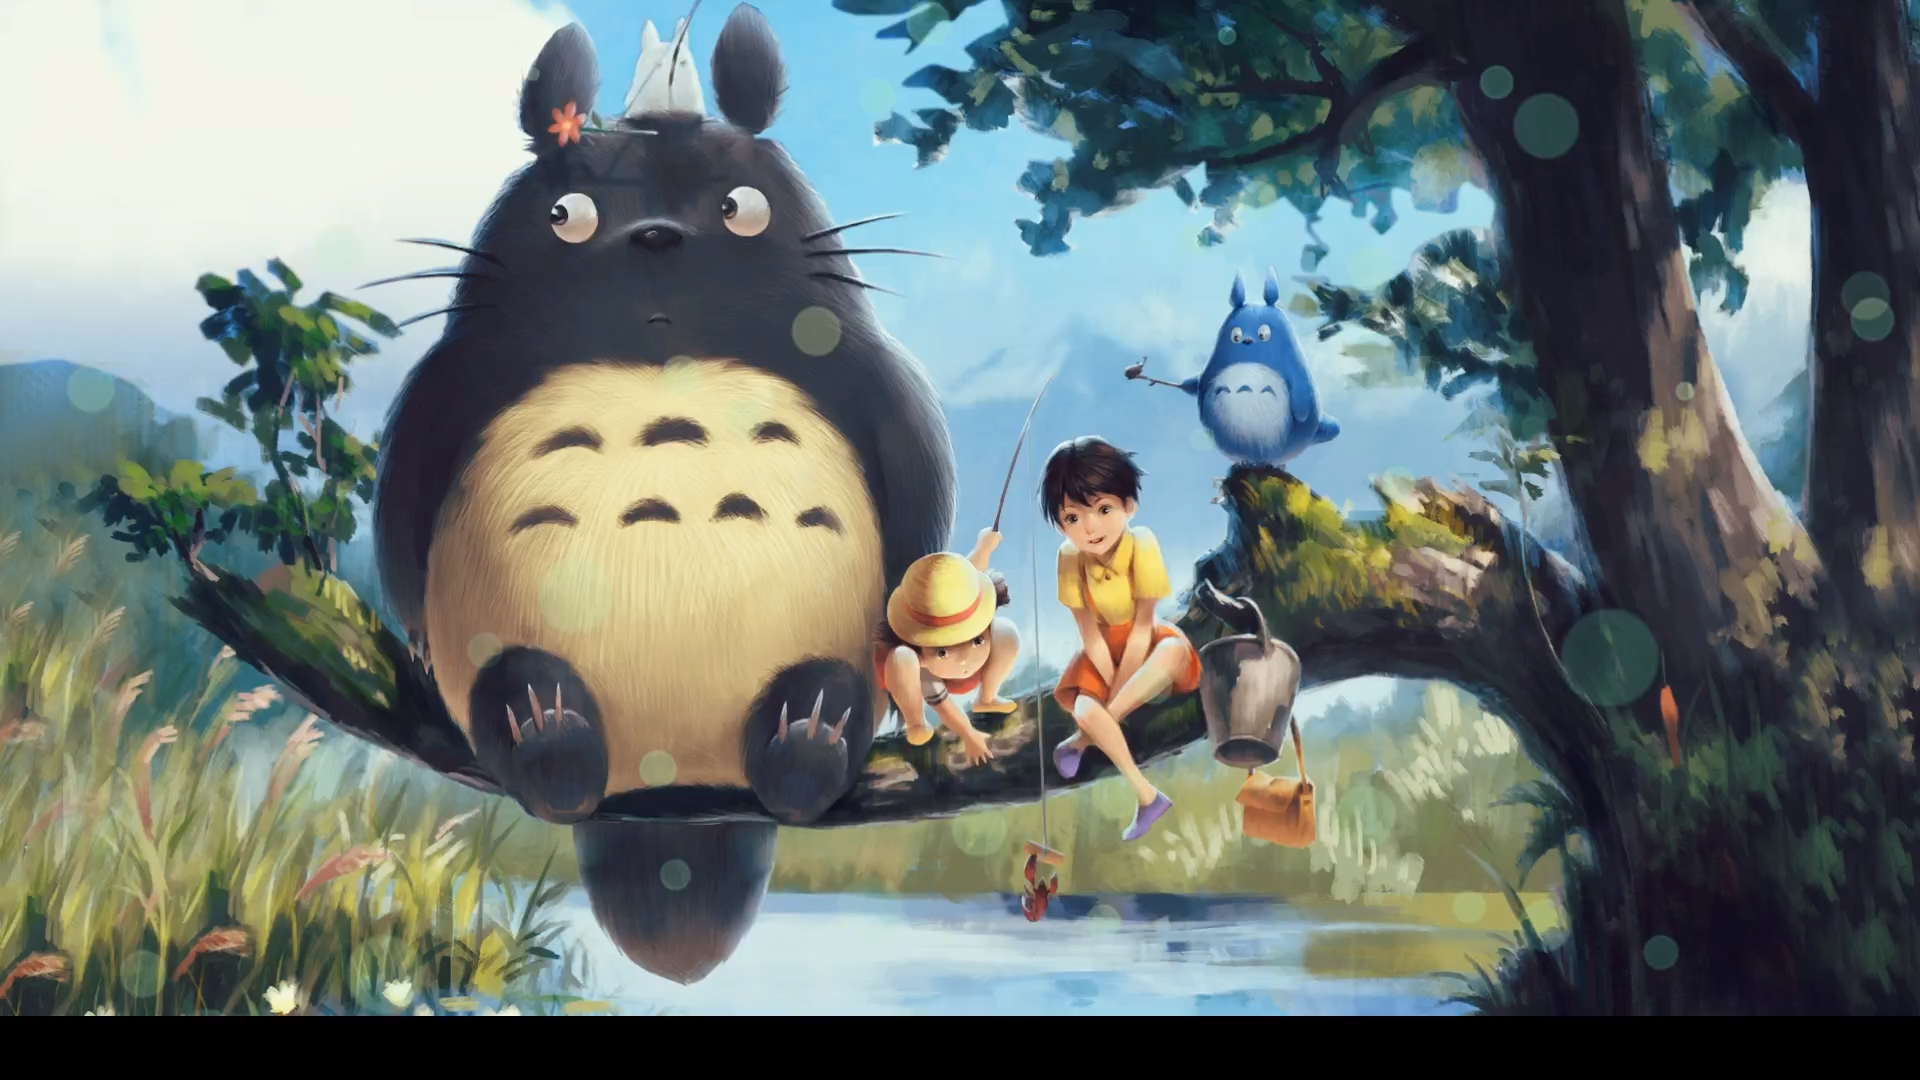 Totoro Anime Wallpaper